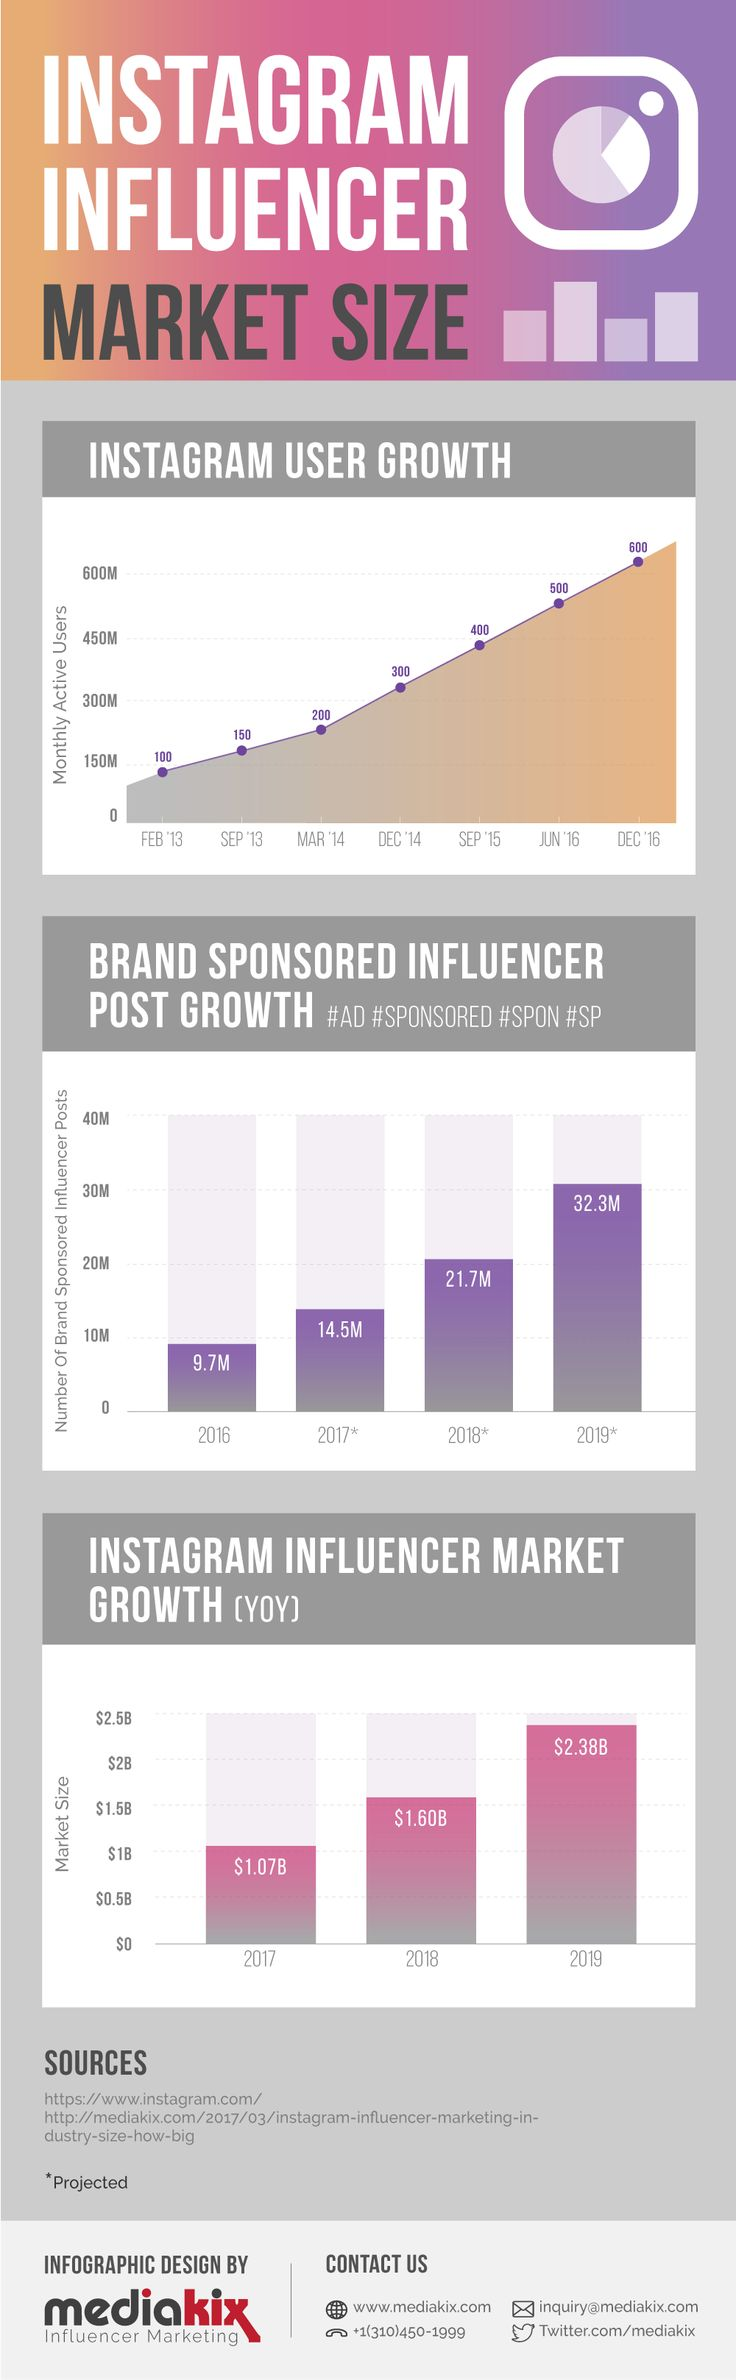 Instagram Influencer Marketing Hits the $1 Billion Mark (Infographic)